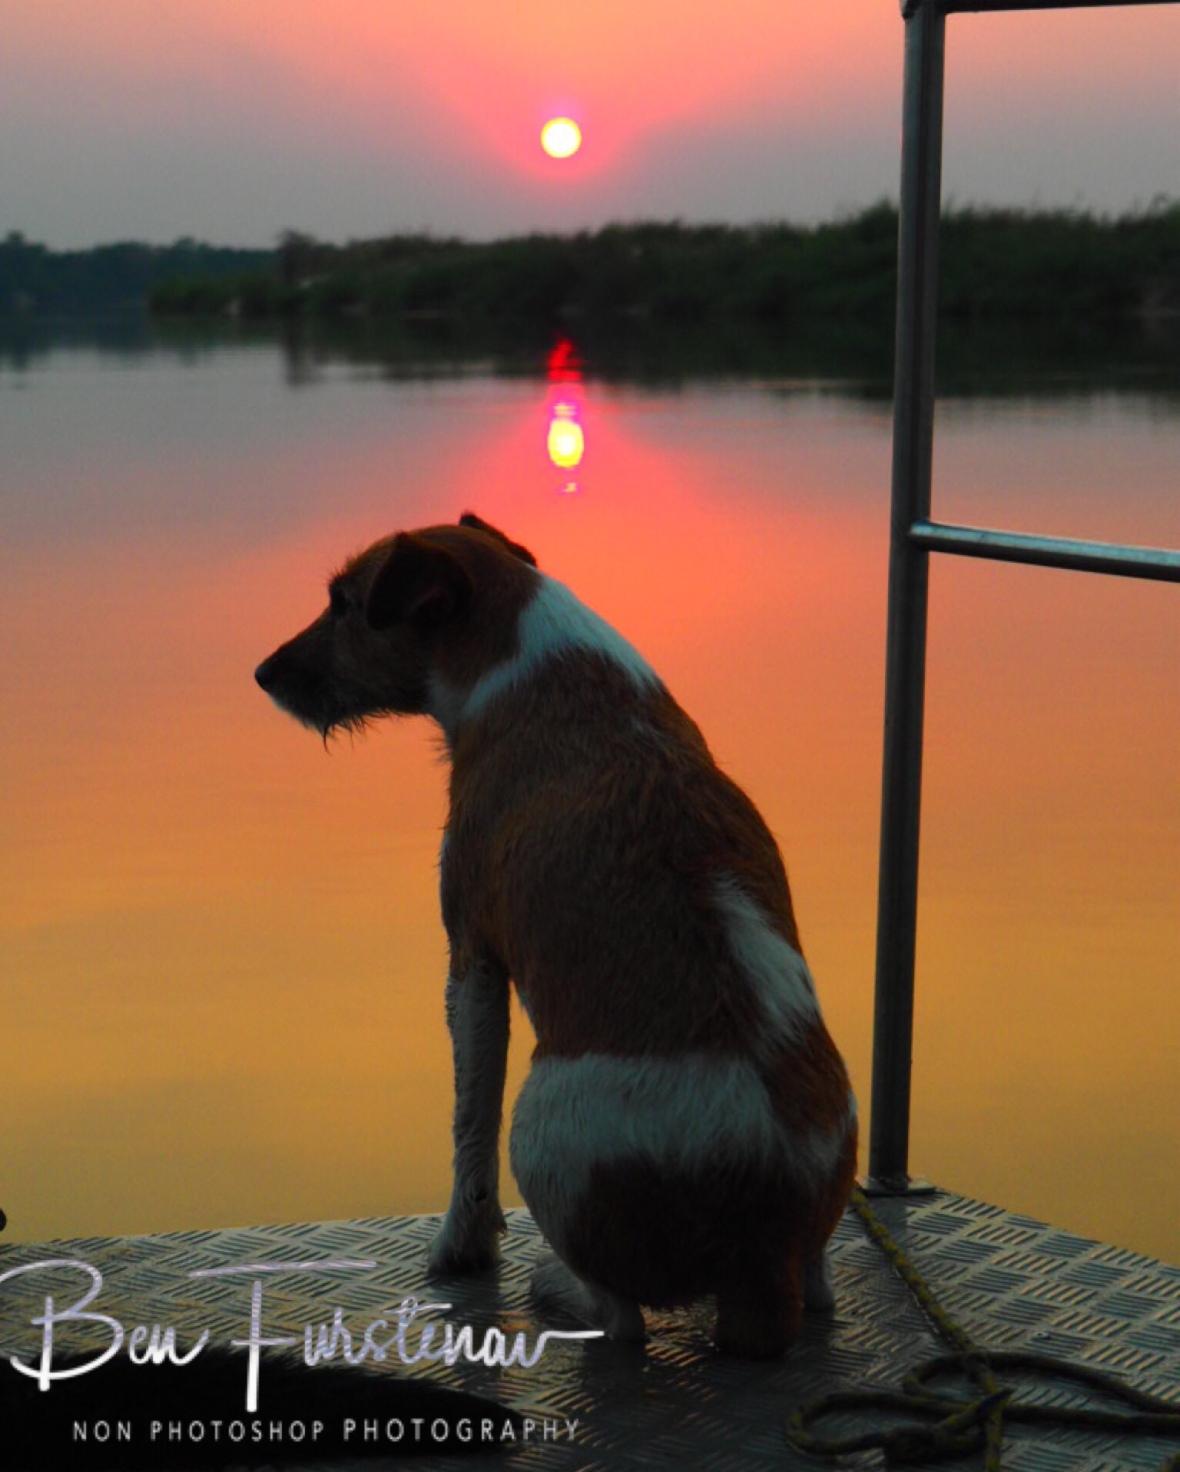 Max on the sunset, Katima Mulilo, Namibia